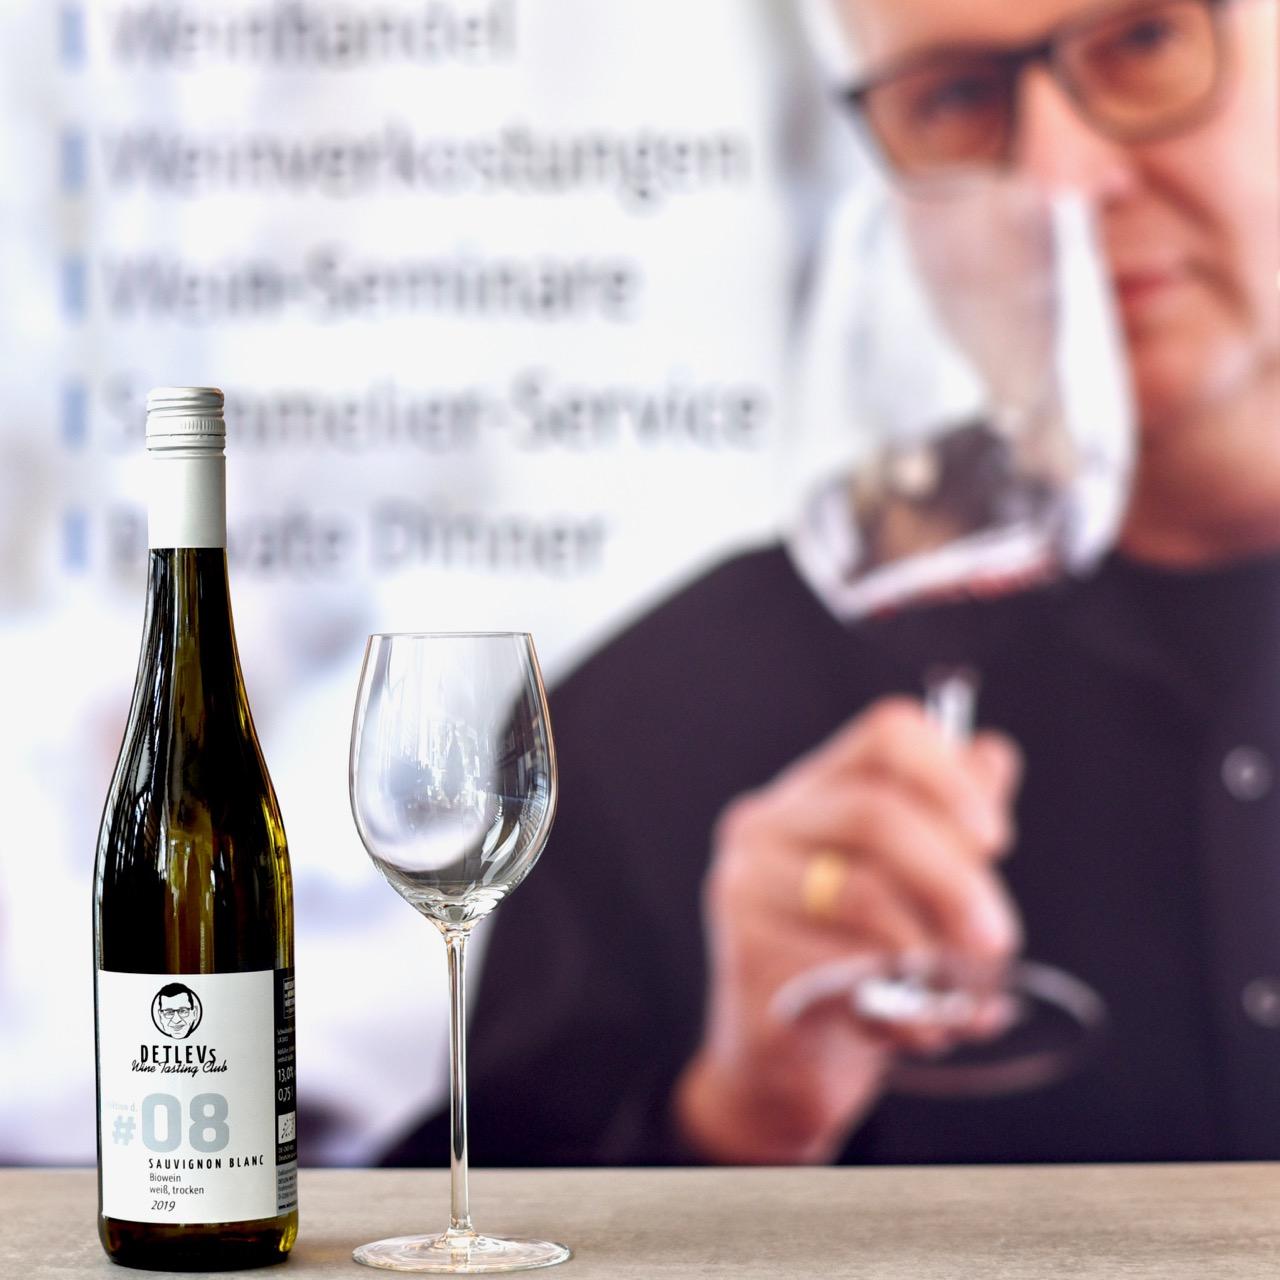 "DETLEVs ""selektion d."" No. 08 Sauvignon Blanc, bio, 2019"